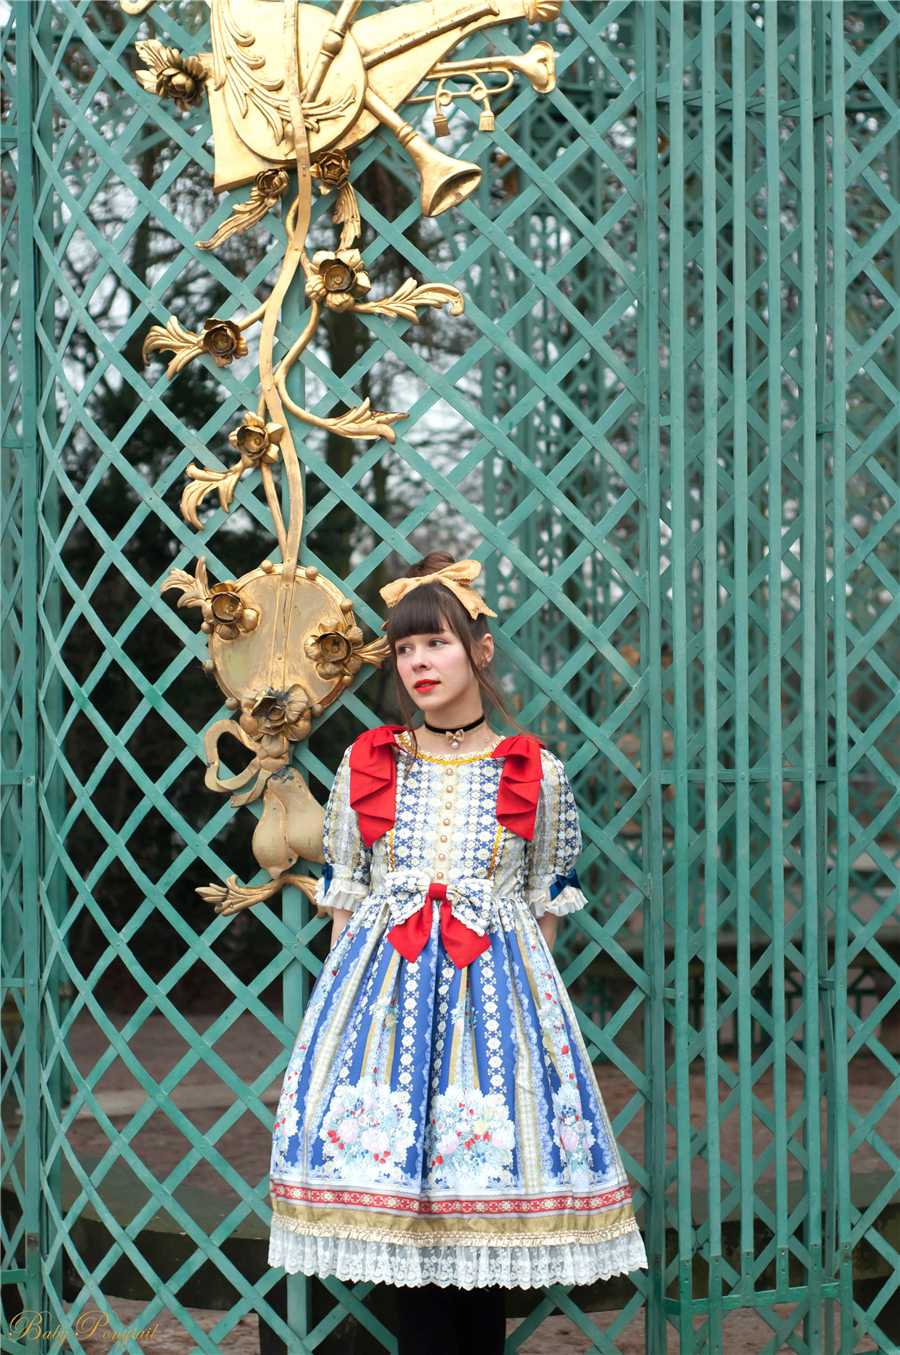 Baby Ponytail_Model Photo_Polly's Garden of Dreams_OP Dark Blue_Claudia_0.jpg